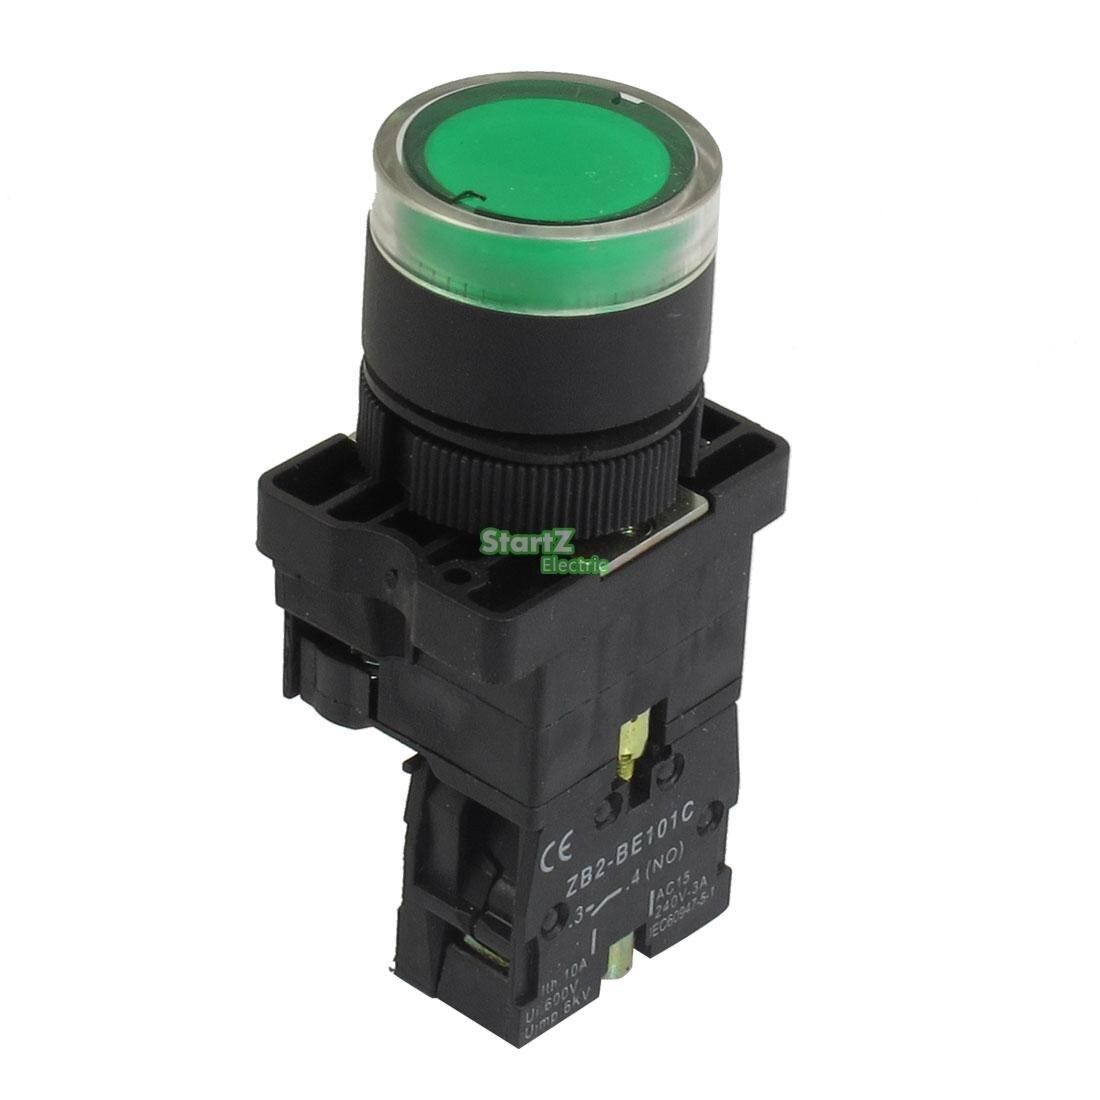 все цены на  5Pcs 22mm NO Green Illuminated Light Momentary Push Button Switch AC 220V ZB2-EW3361  онлайн